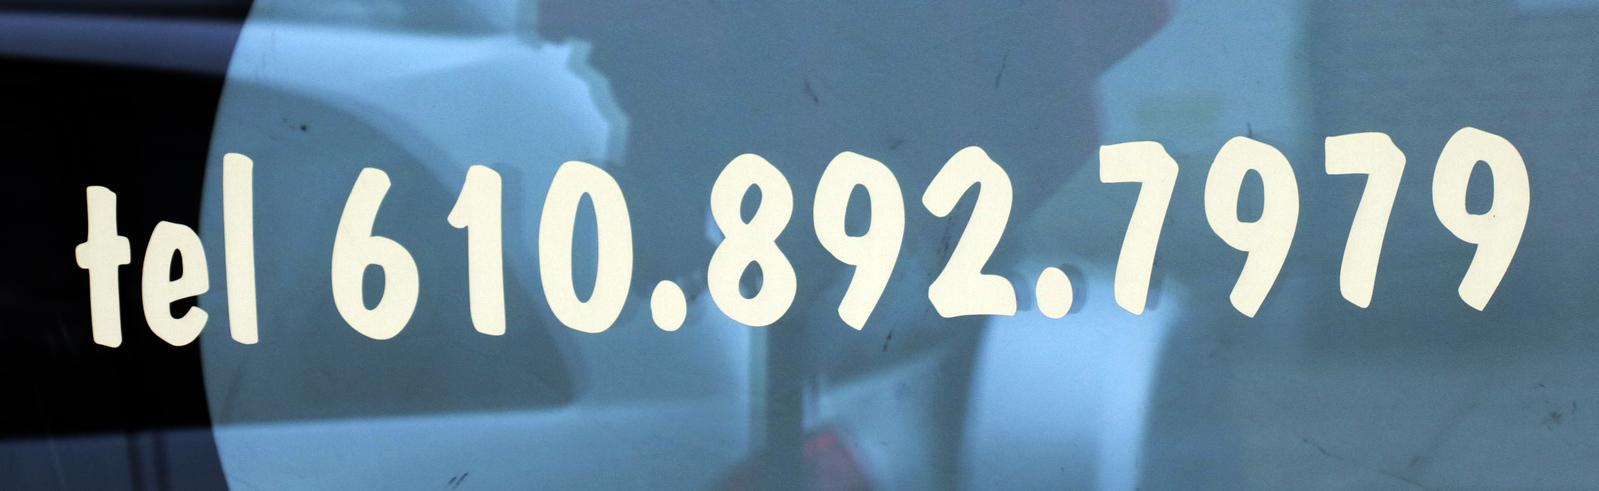 17:06:27-135